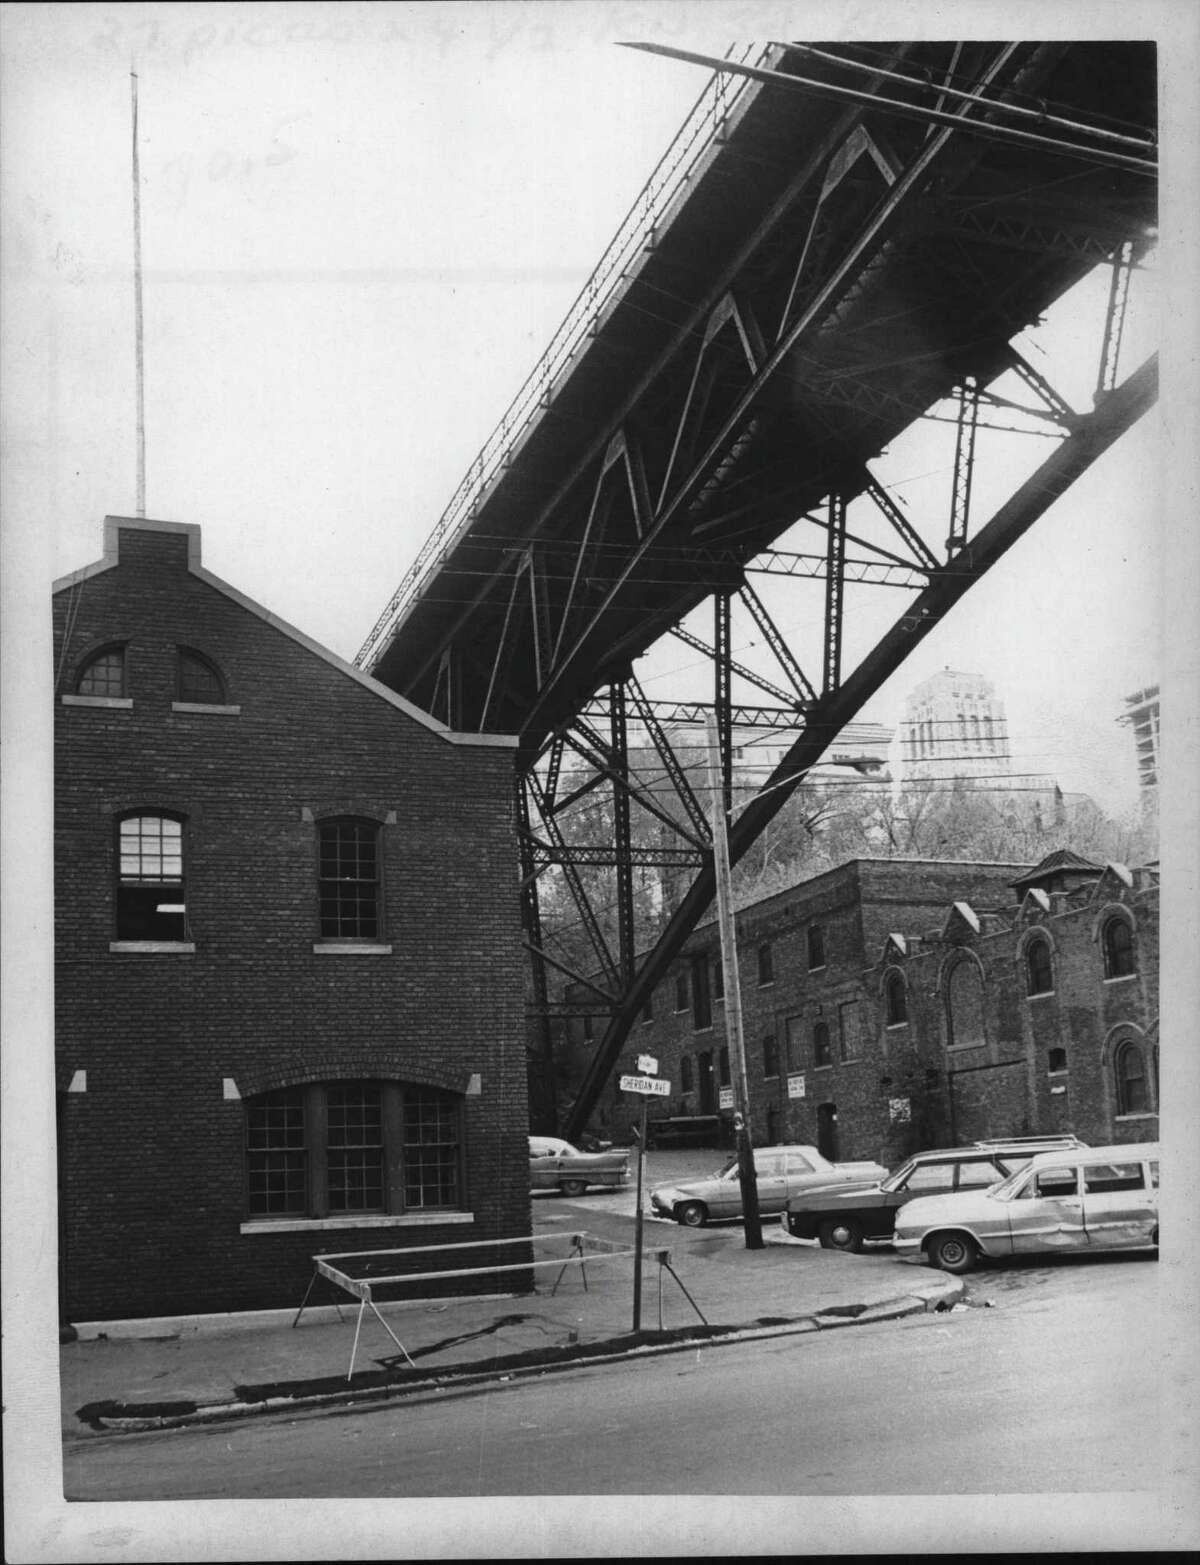 Albany, New York - Hawk Street Viaduct. 1970 (Times Union Archive)